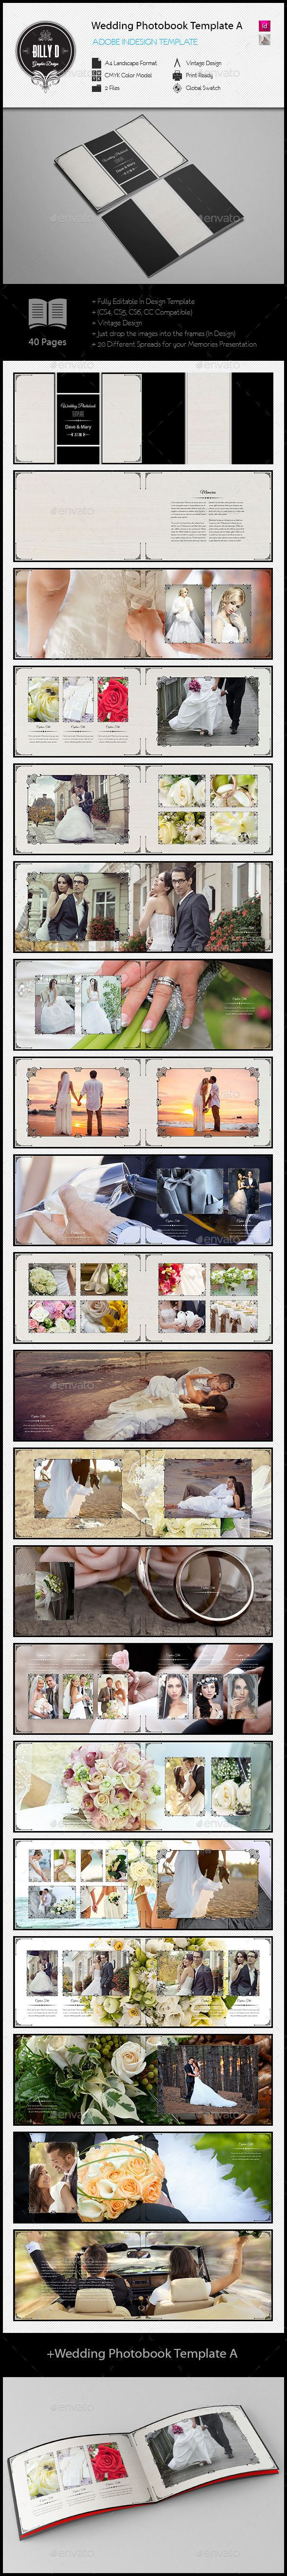 Wedding Photobook Template A